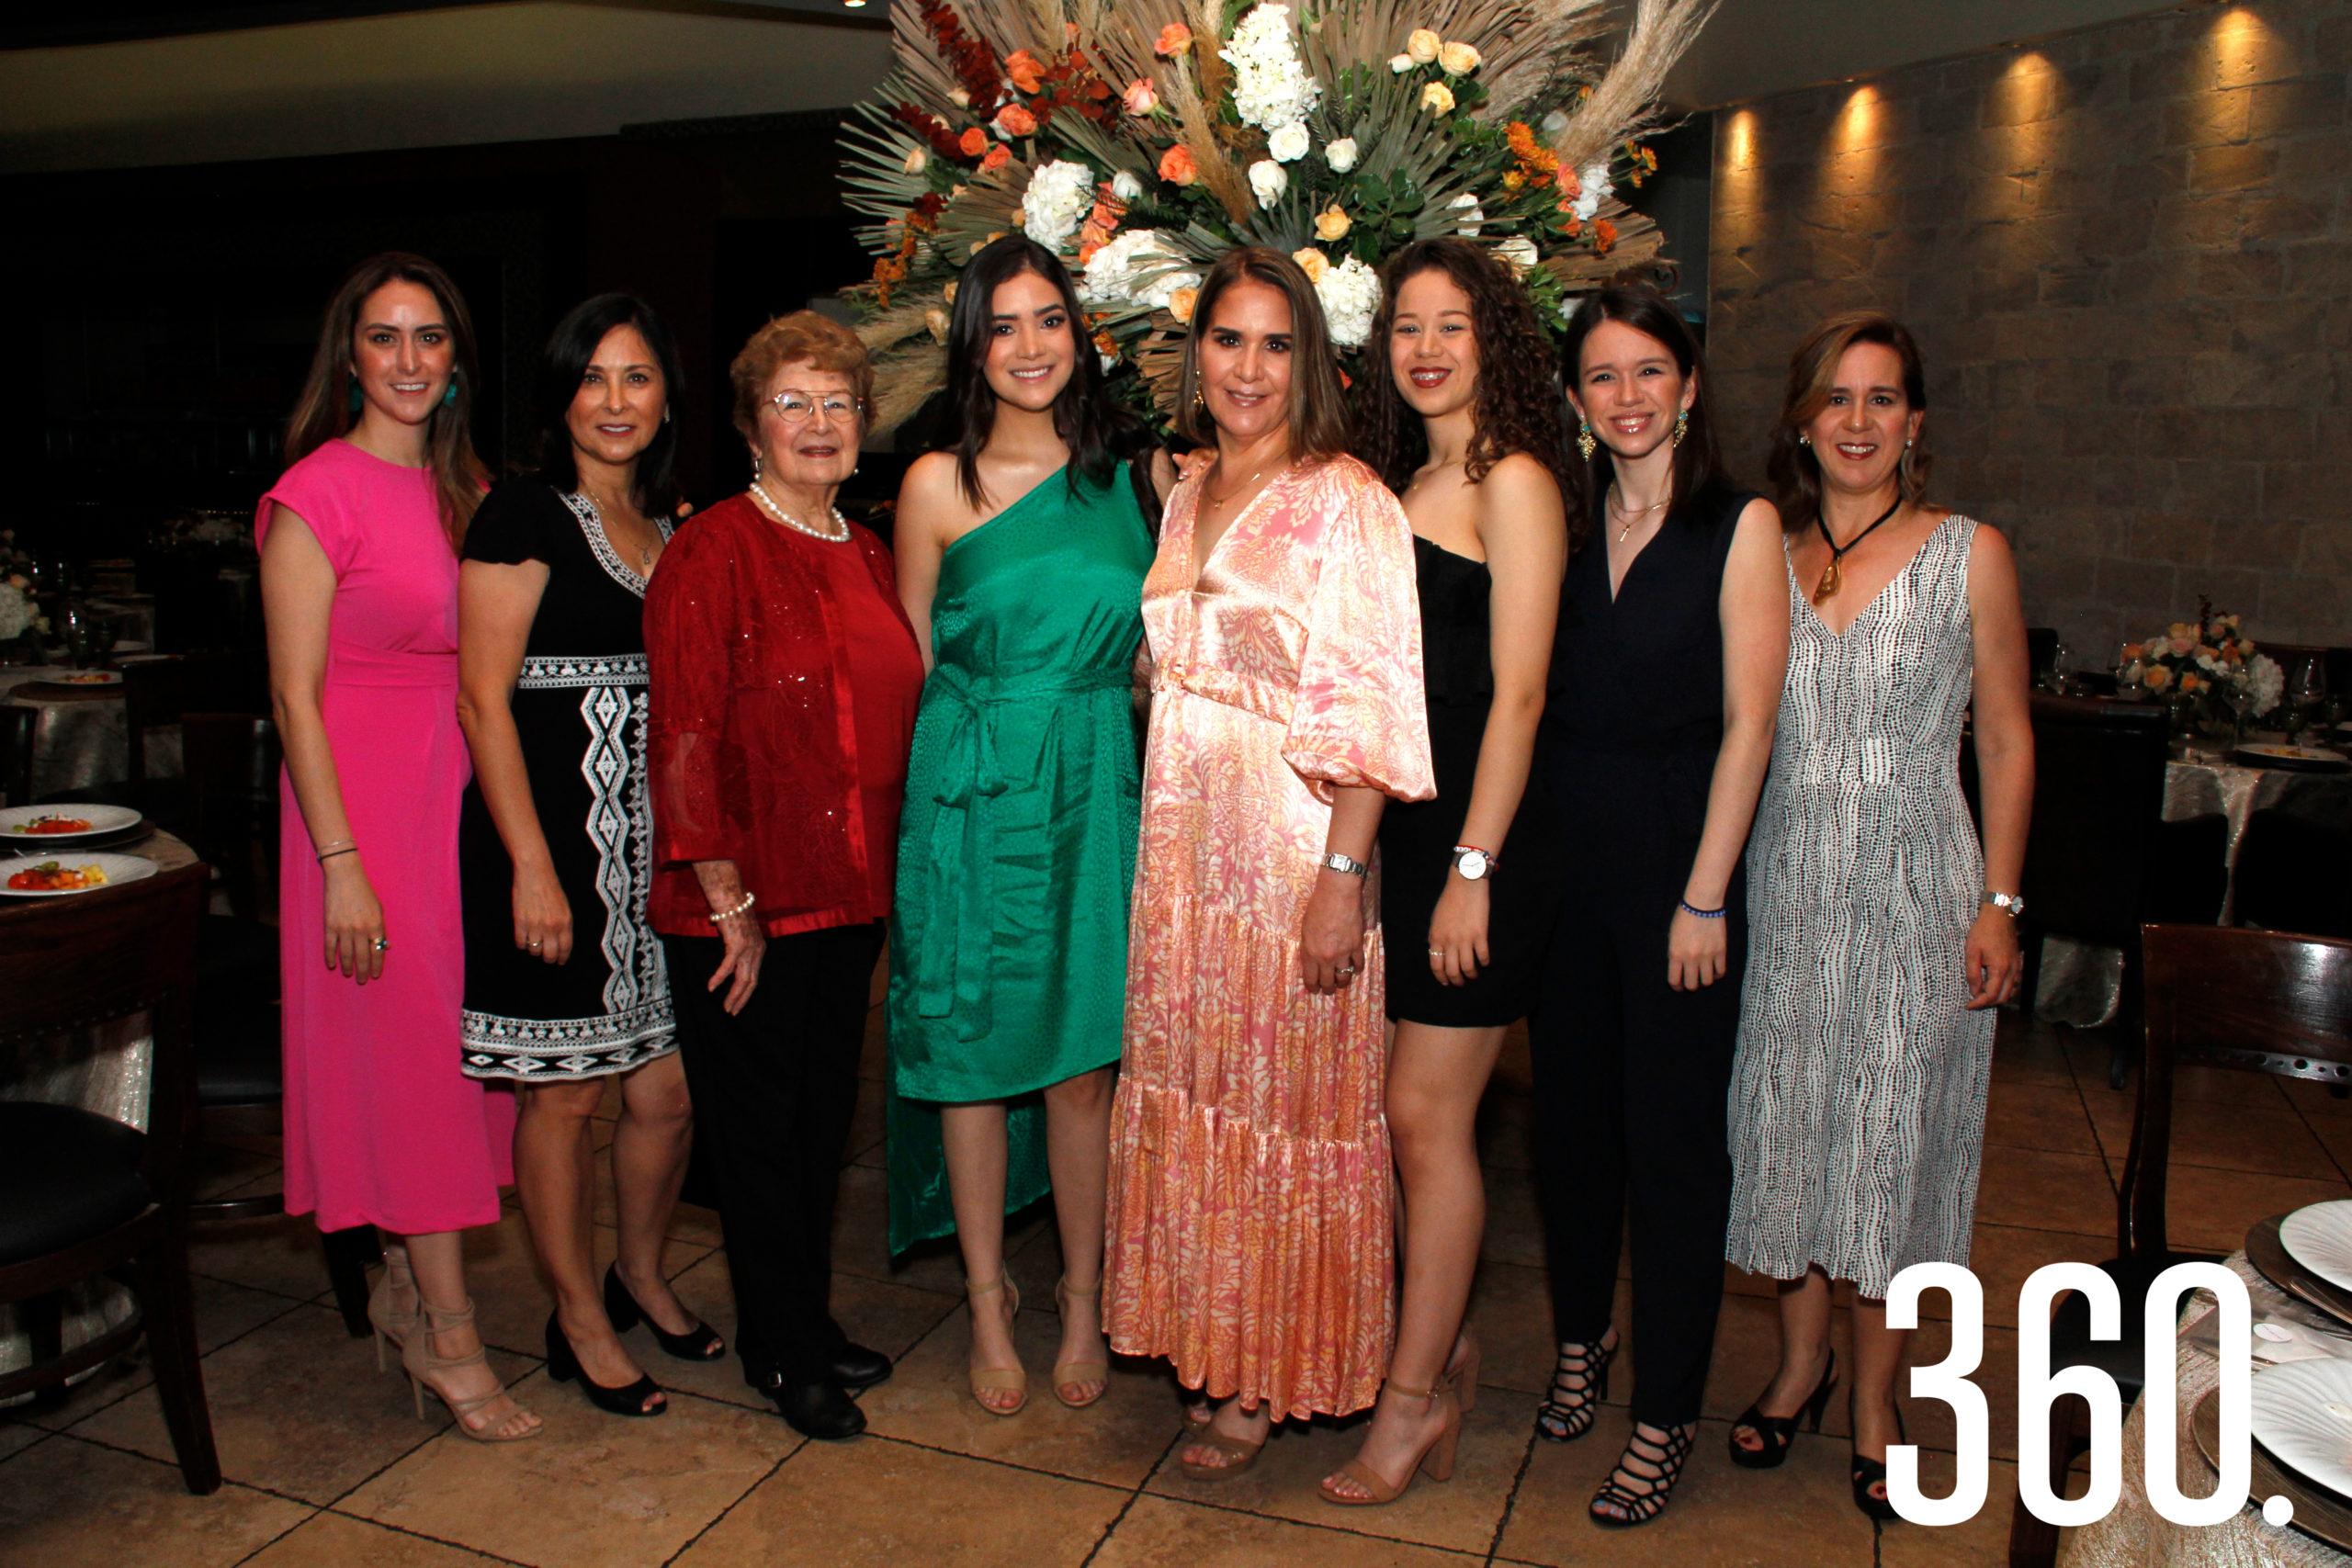 Beatriz Gómez, Beatriz Roldán, Yoyita López de Gómez, Sofía Chávez, Teté Gómez, Fernanda Vásquez, Cecilia Vásquez y Luly Gómez.